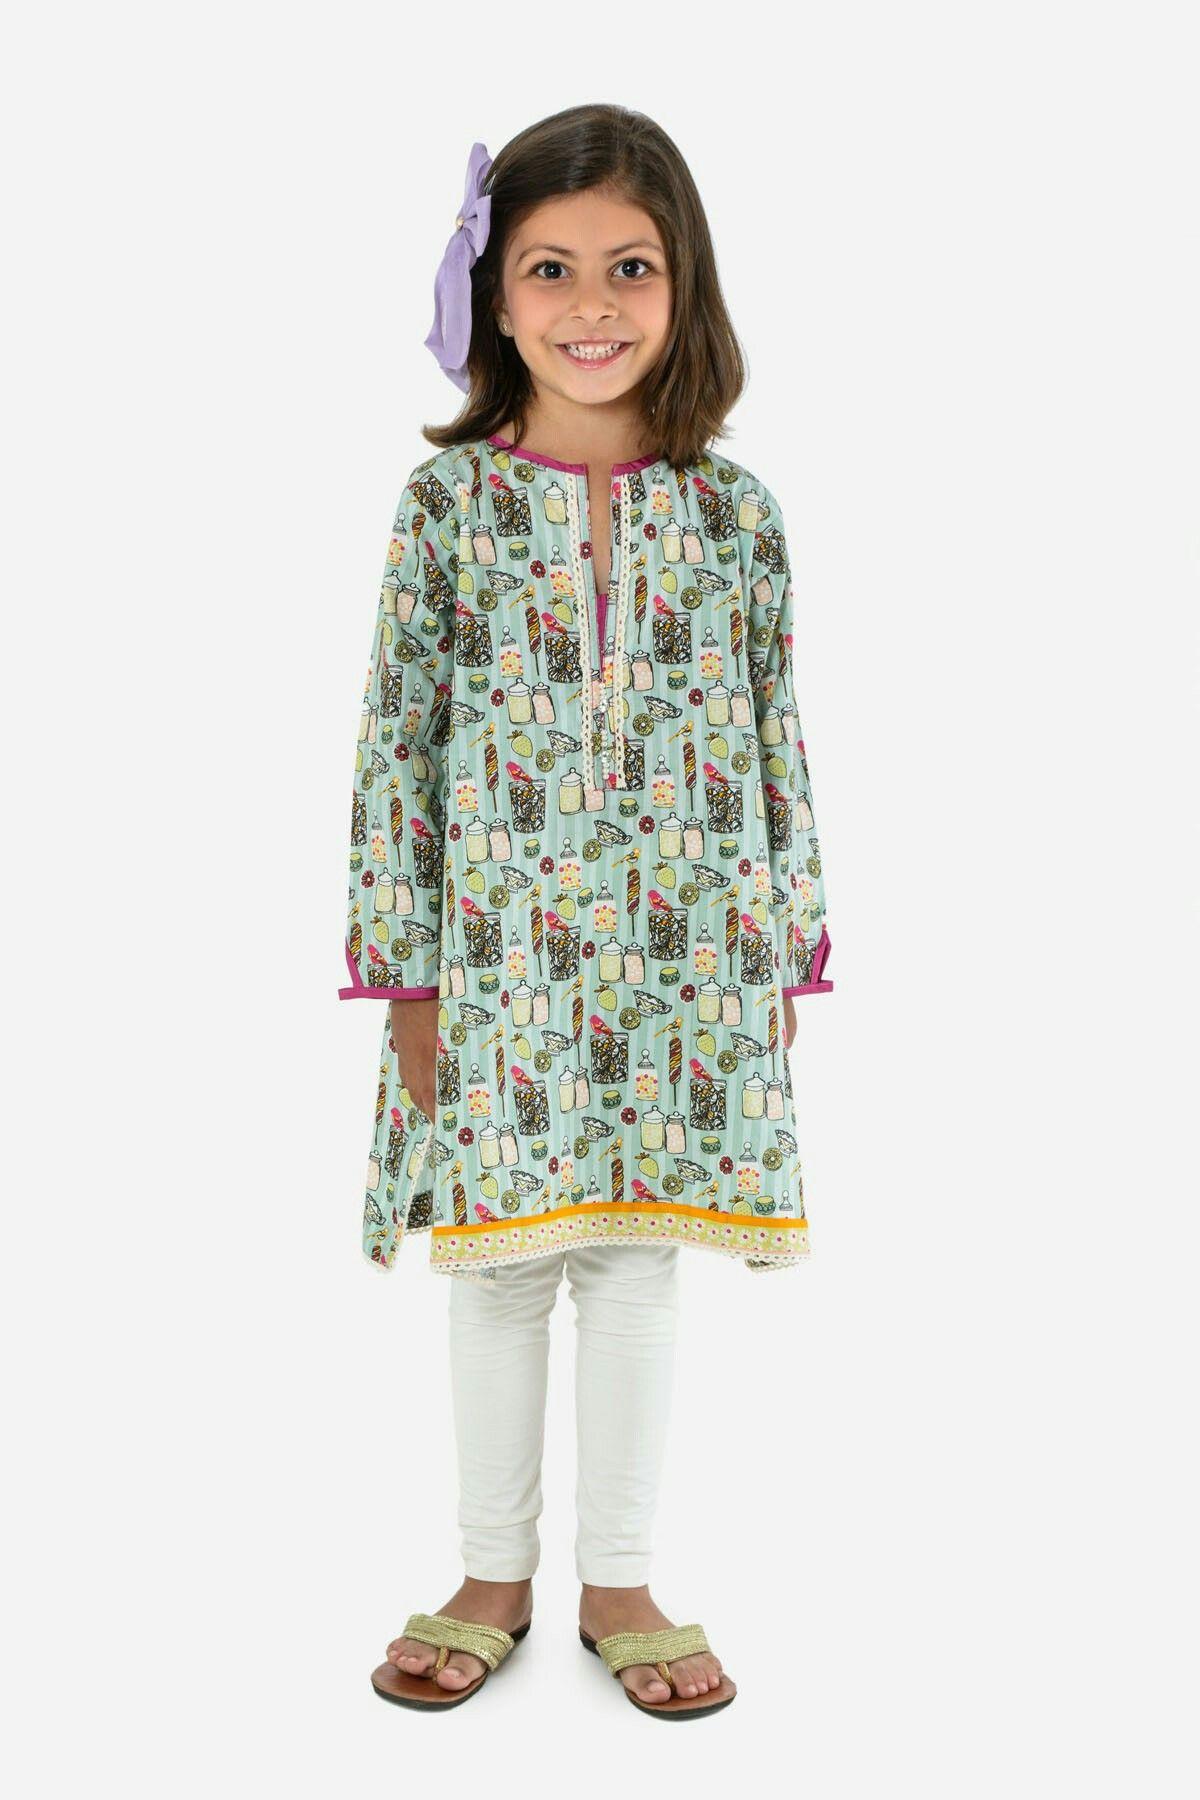 b3086a0403750 Khaadi kids pakistan | Little girl | Kids fashion, Kids outfits ...